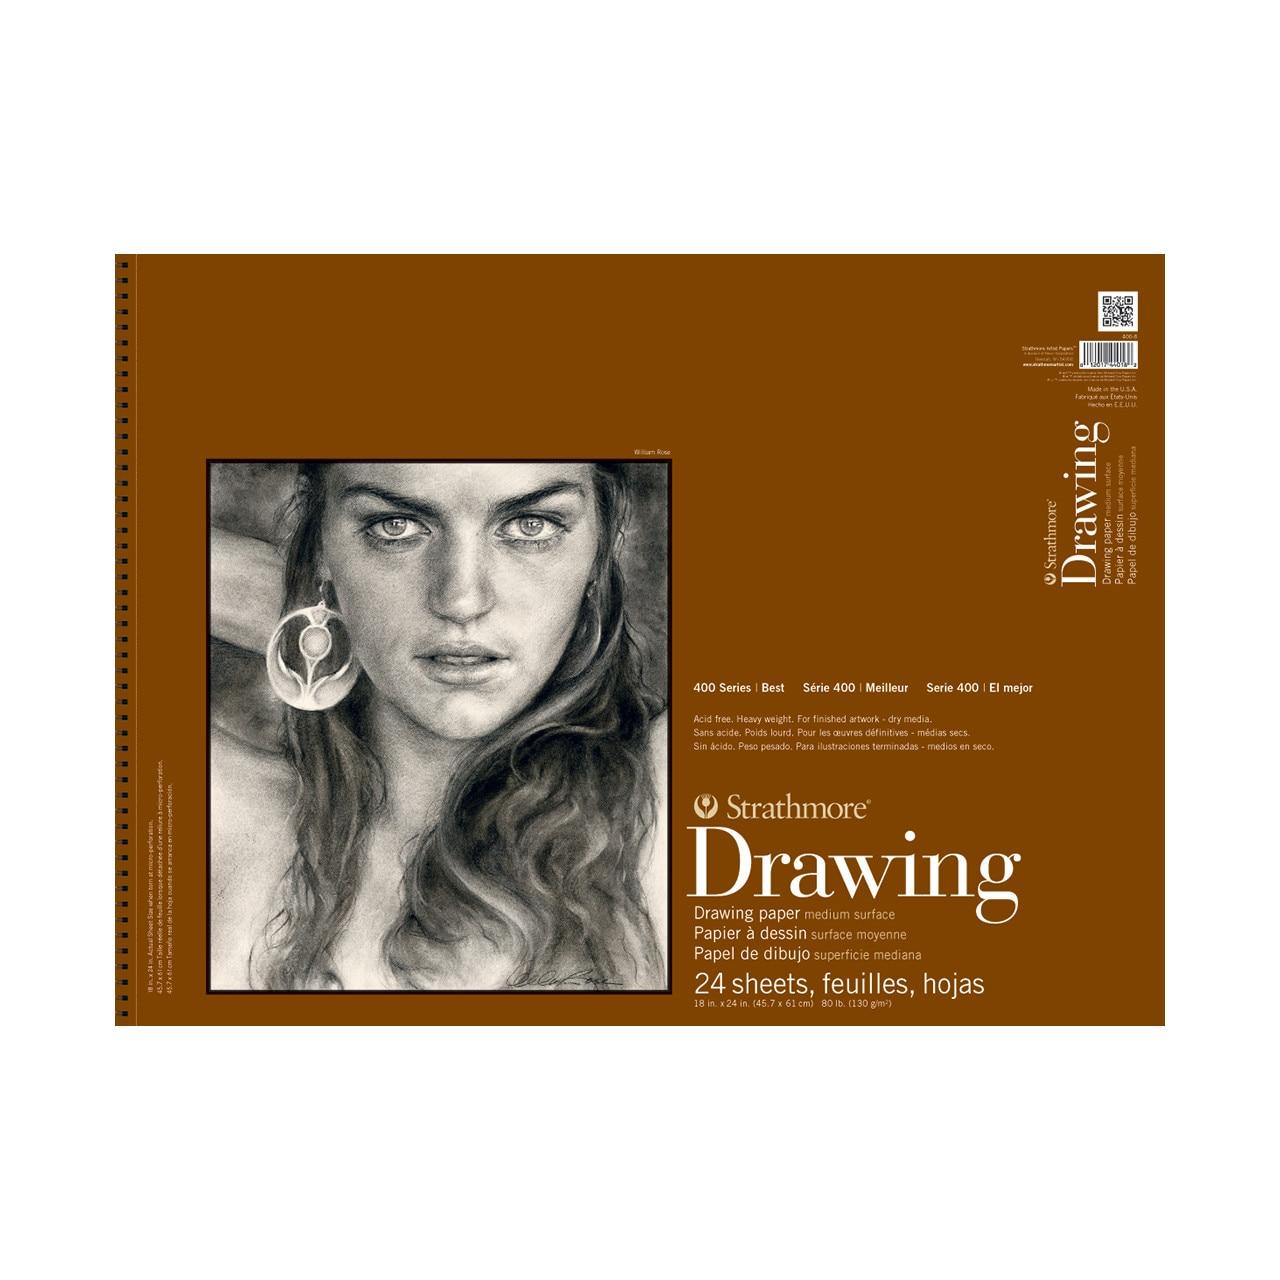 "Strathmore Drawing Paper Pad, 400 Series, Medium Surface, 18"" x 24"""